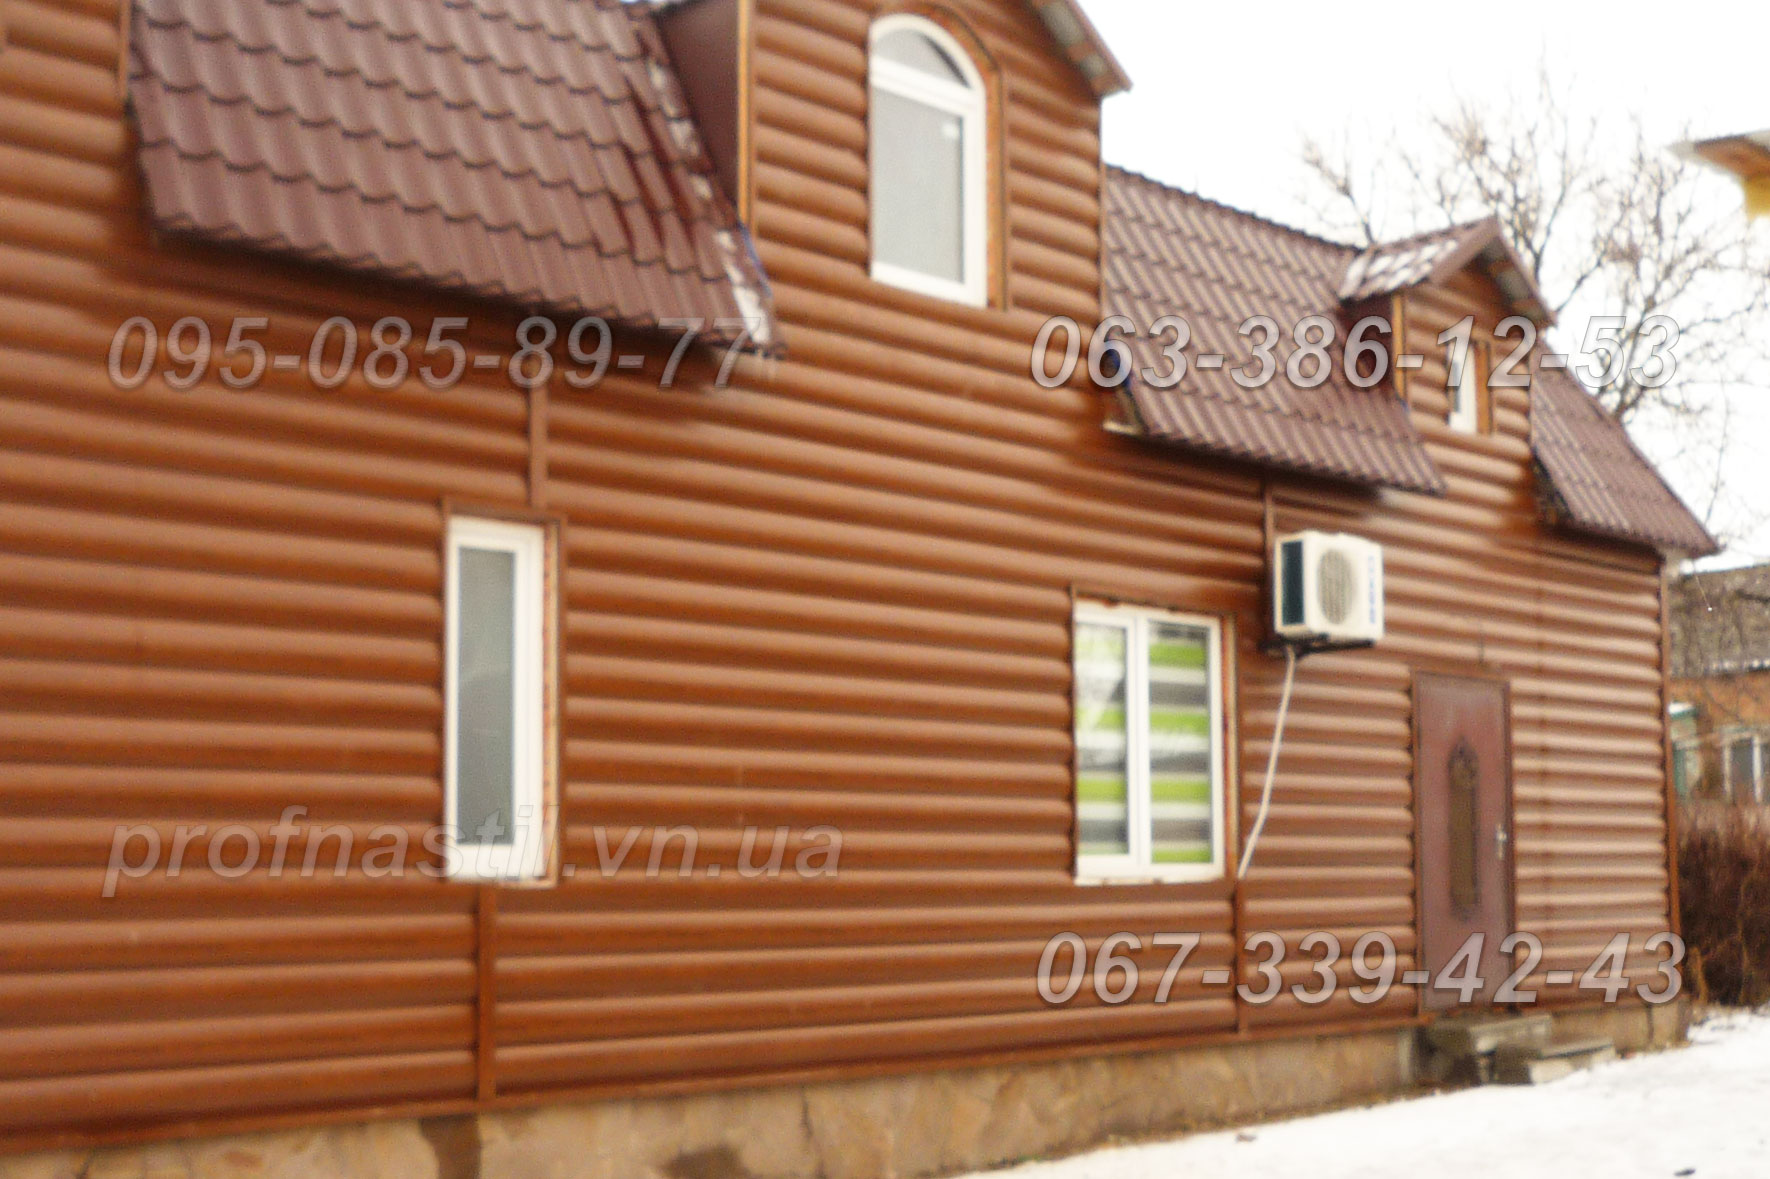 Металлический сайдинг блок хаус под дерево монтаж